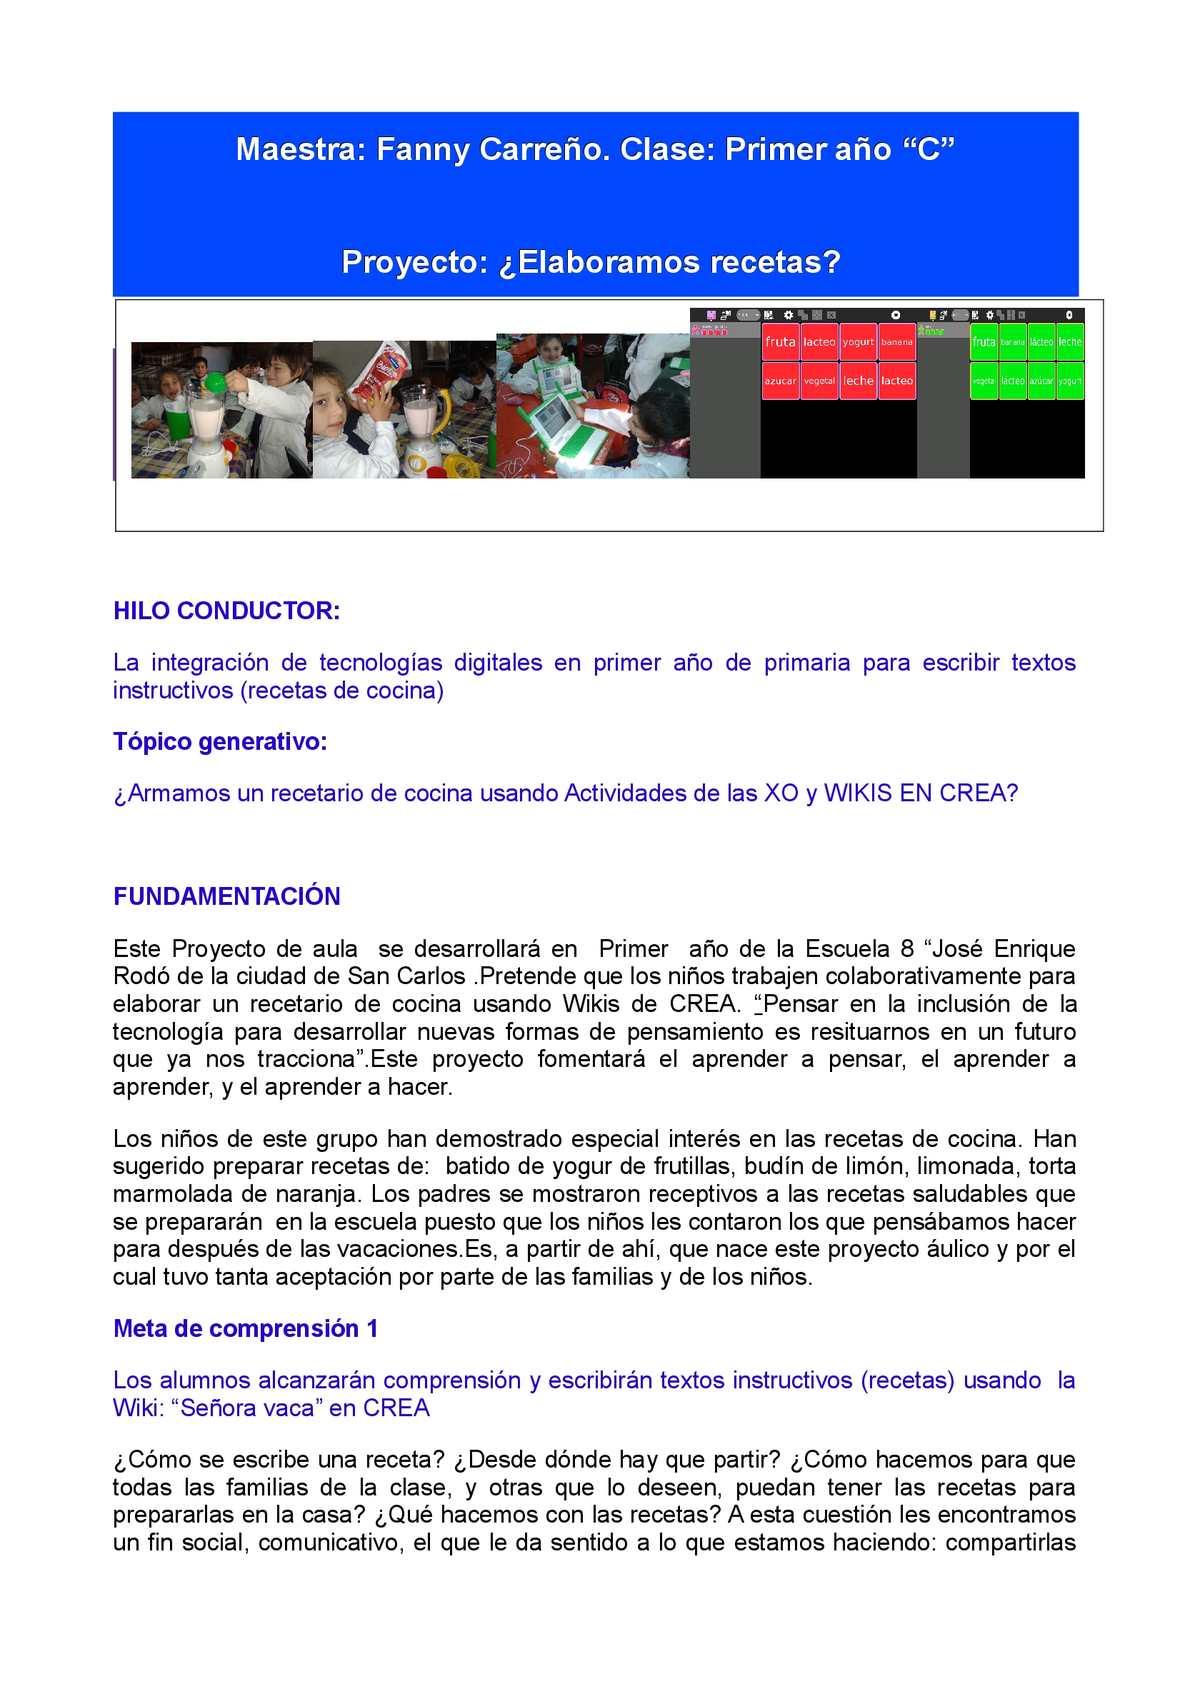 Calaméo - Escuela Nº 8 de Maldonado - 1er. año Proyecto recetario